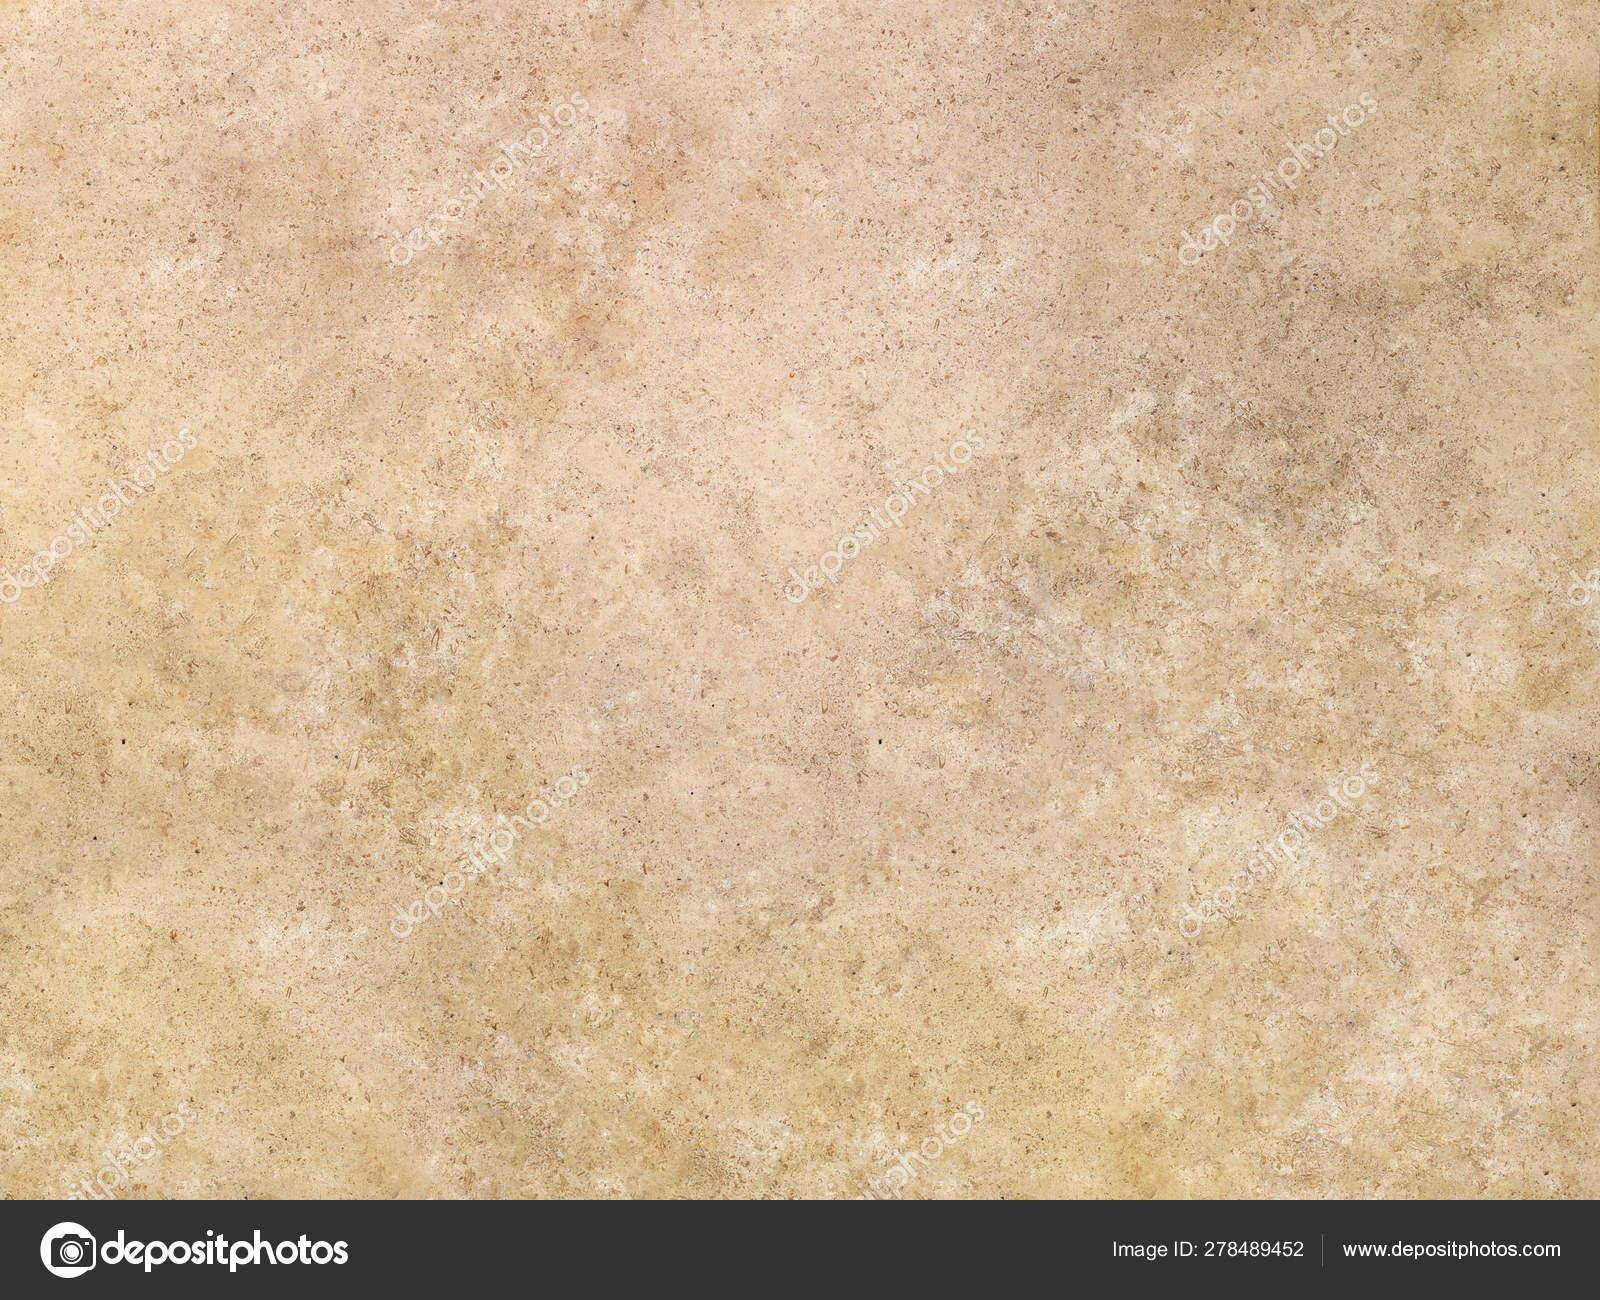 Tan Travertine Marble Surface Texture Stock Photo C Mwiens 278489452